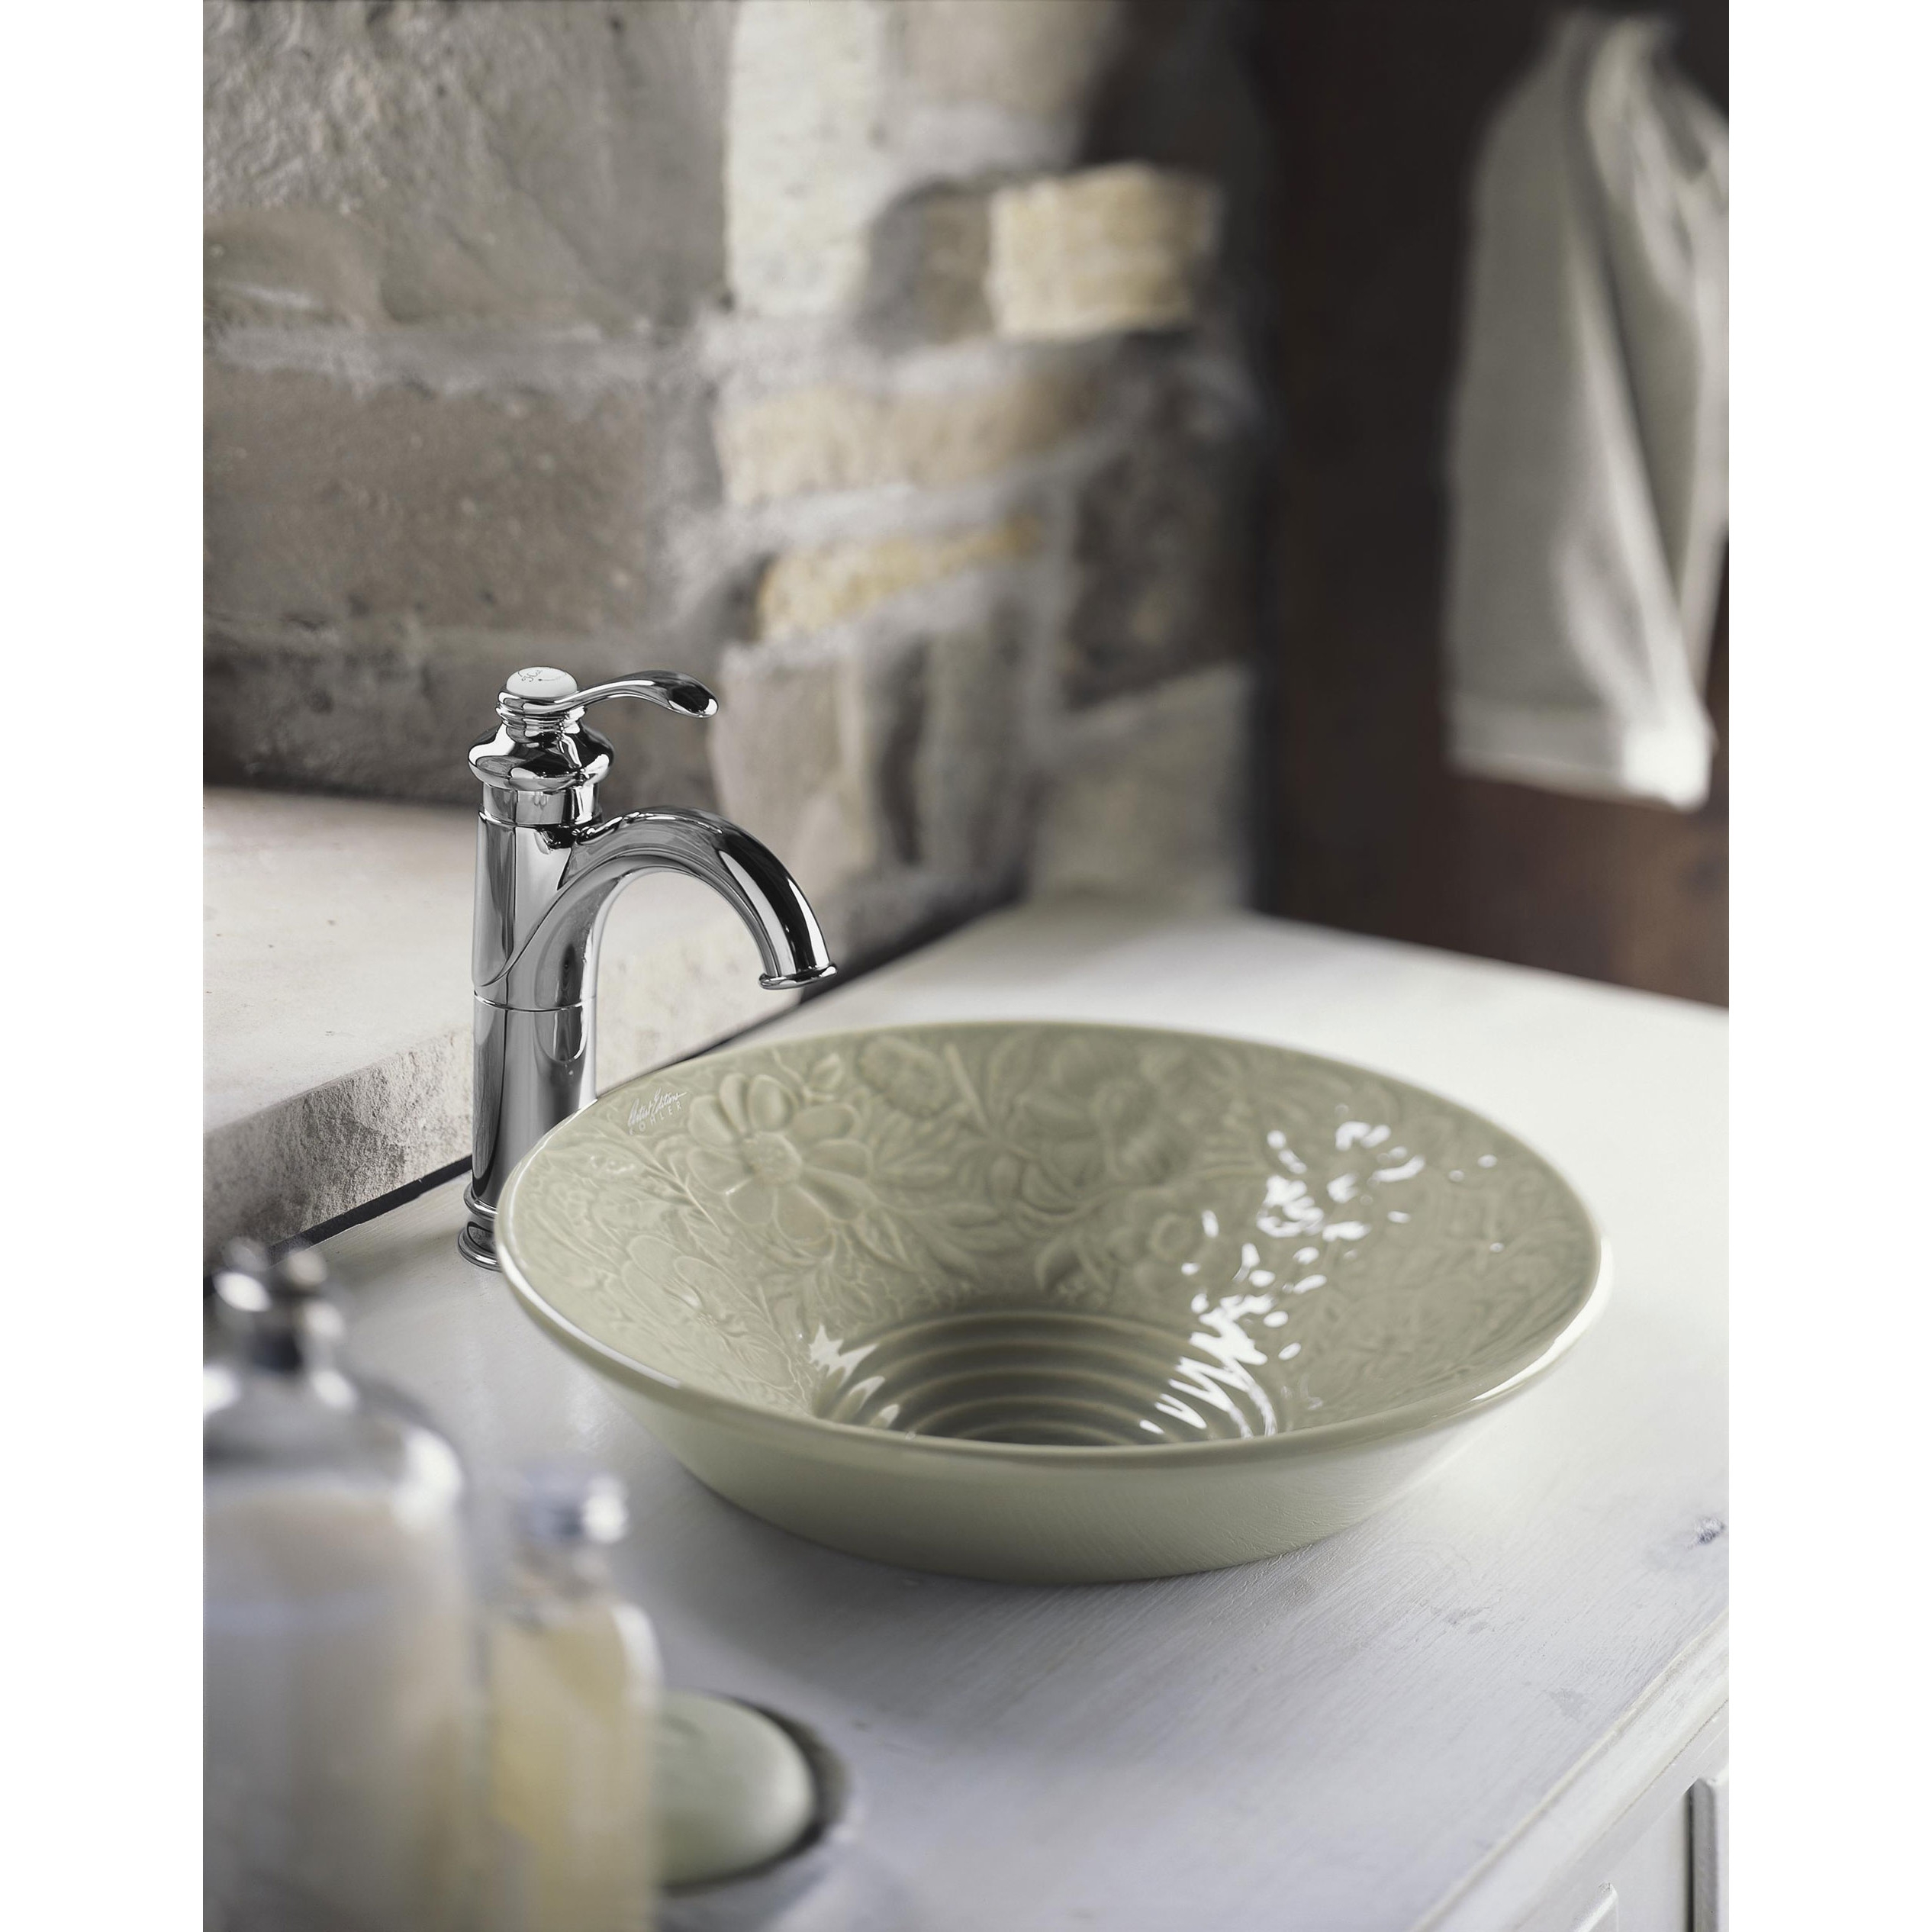 Ideas, kohler stance sink faucet kohler stance sink faucet october 2016s archives tall bathroom faucet outdoor kitchen 2532 x 2532  .